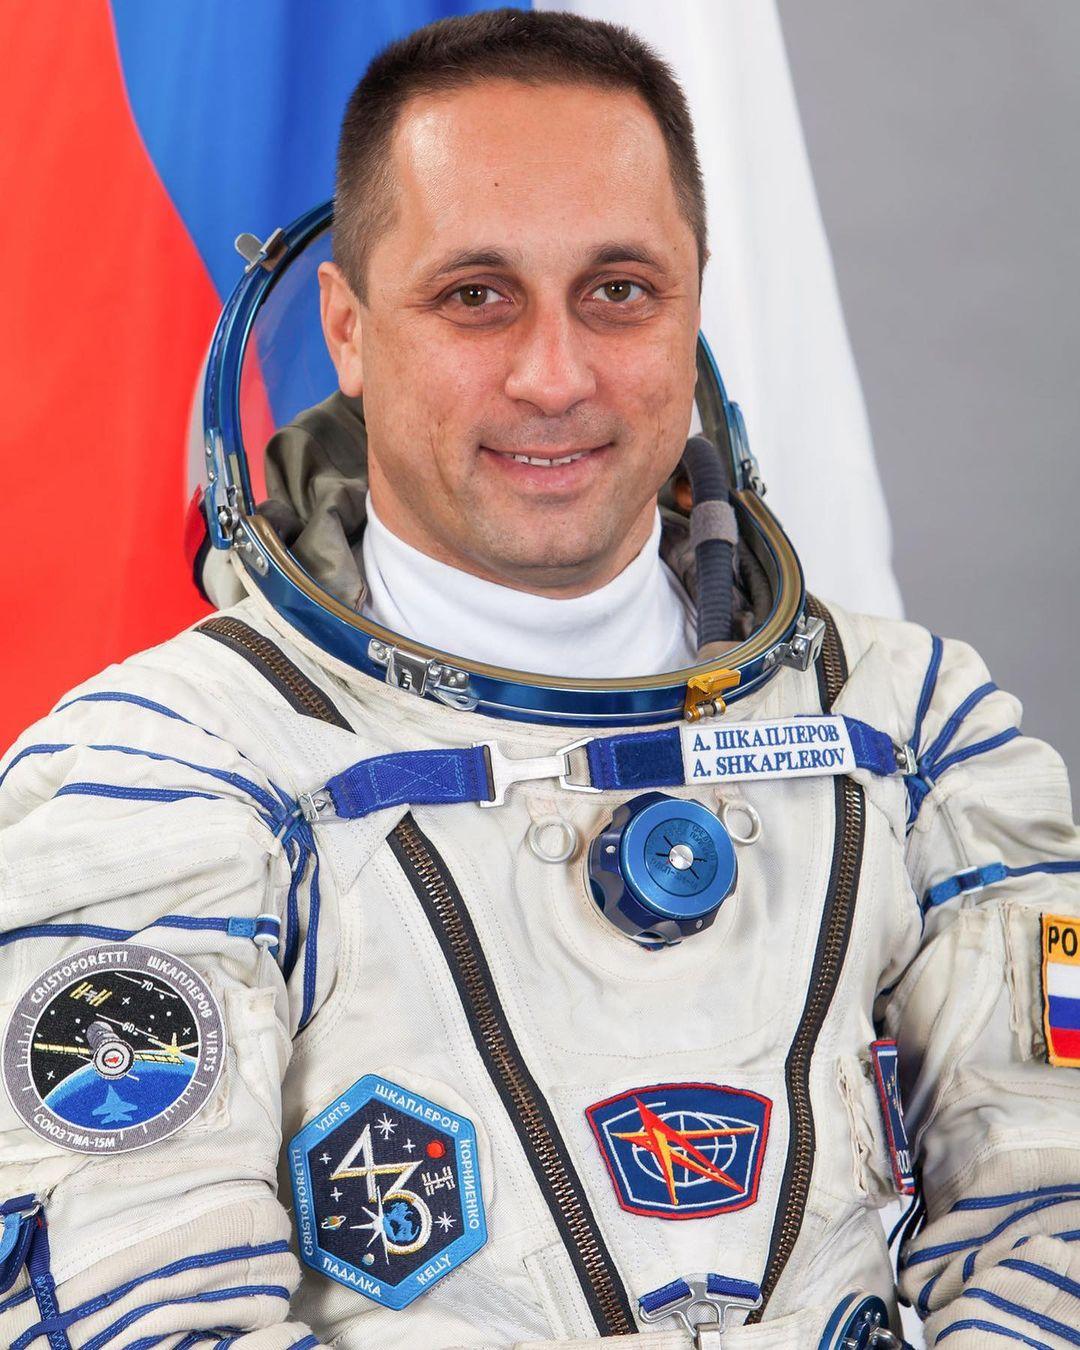 Антон Шкаплеров